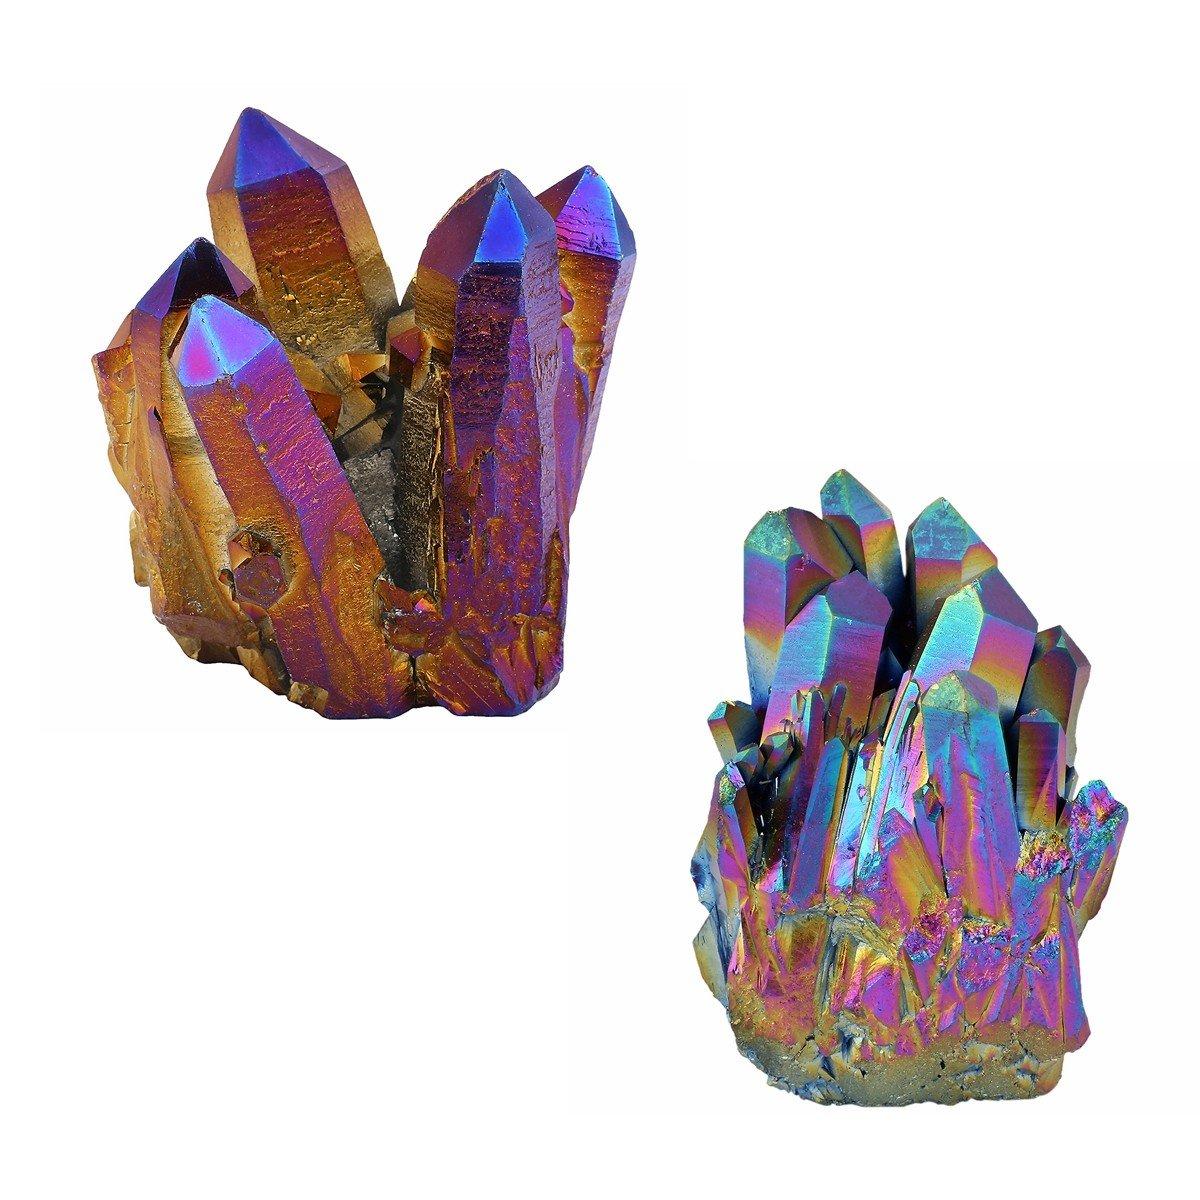 mookaitedecor Energie pietre e cristalli géode DRUSE cristallo decoratif quarzo Irregulier per casa Decoration, Pietra, 01-arc en Ciel(30-60mm)